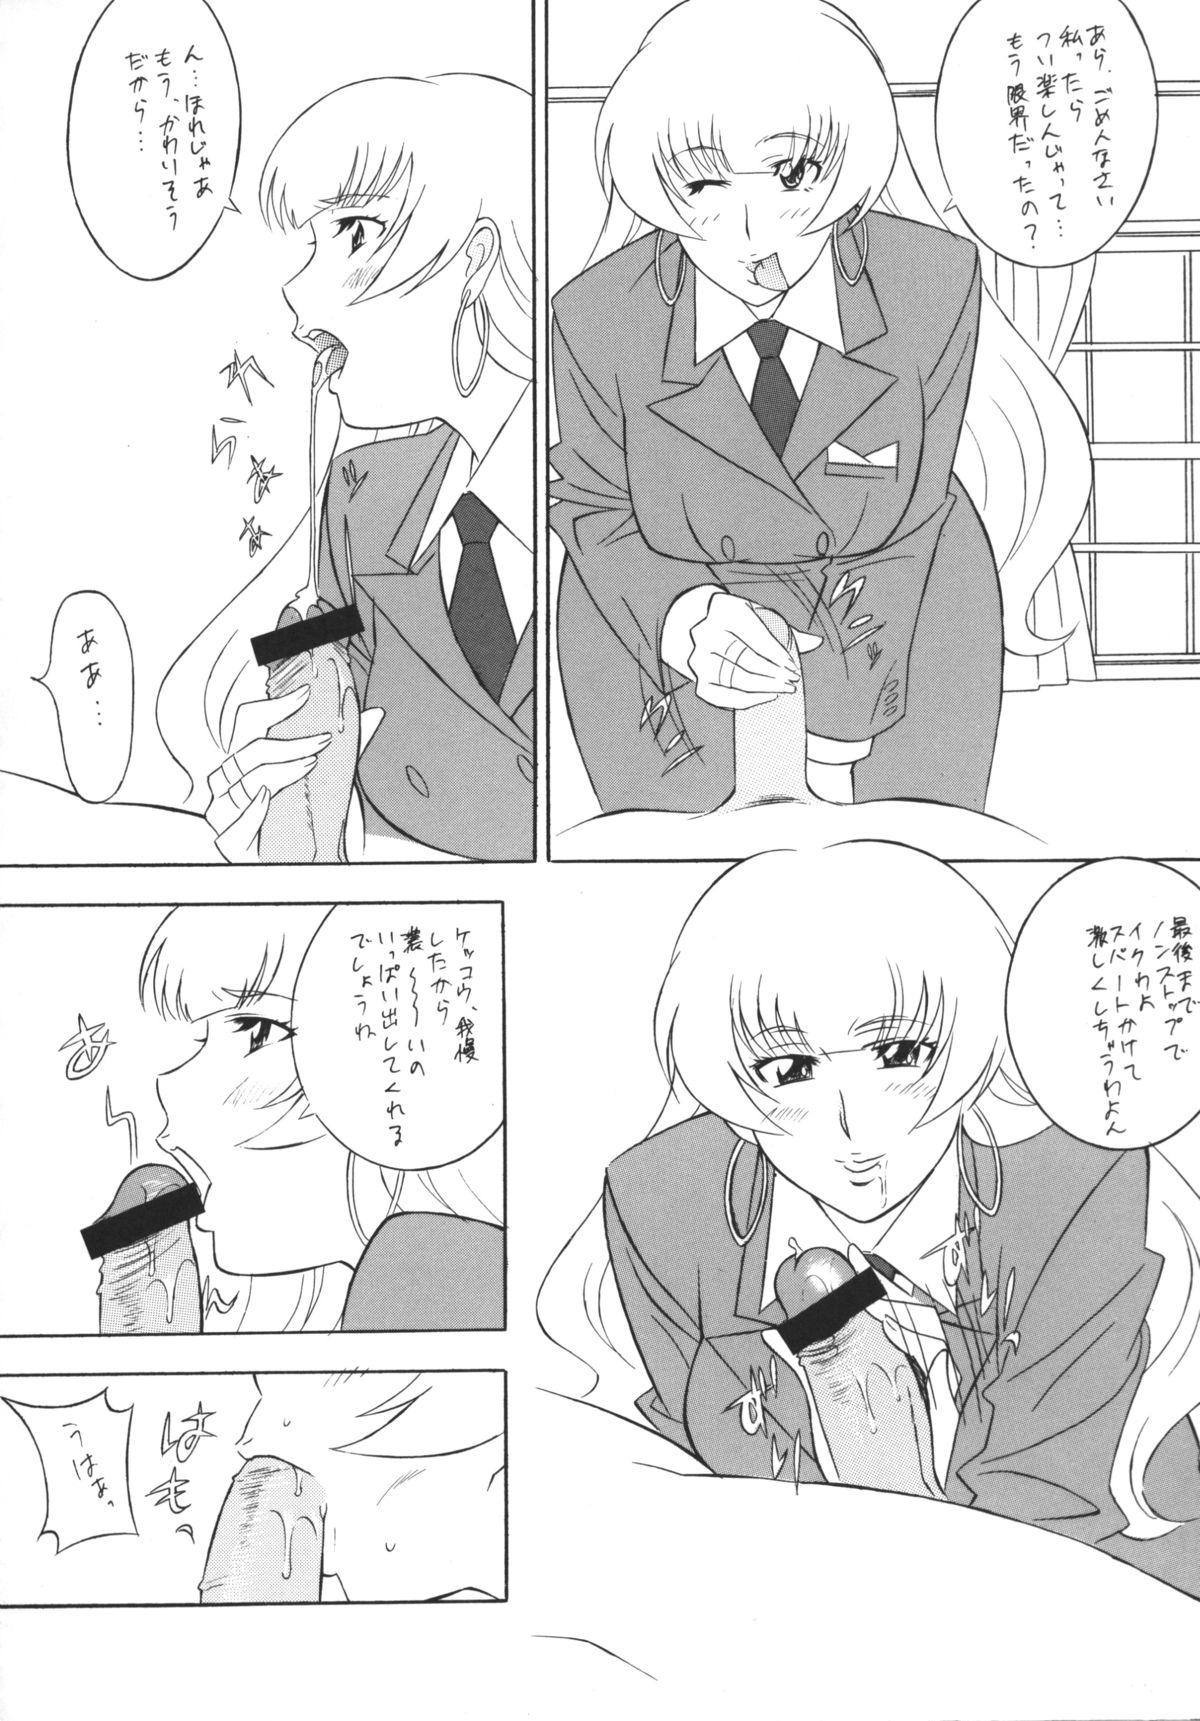 [Okachimentaiko (H-H, Minazuki Akira) Oh! Hentai (Various) 52